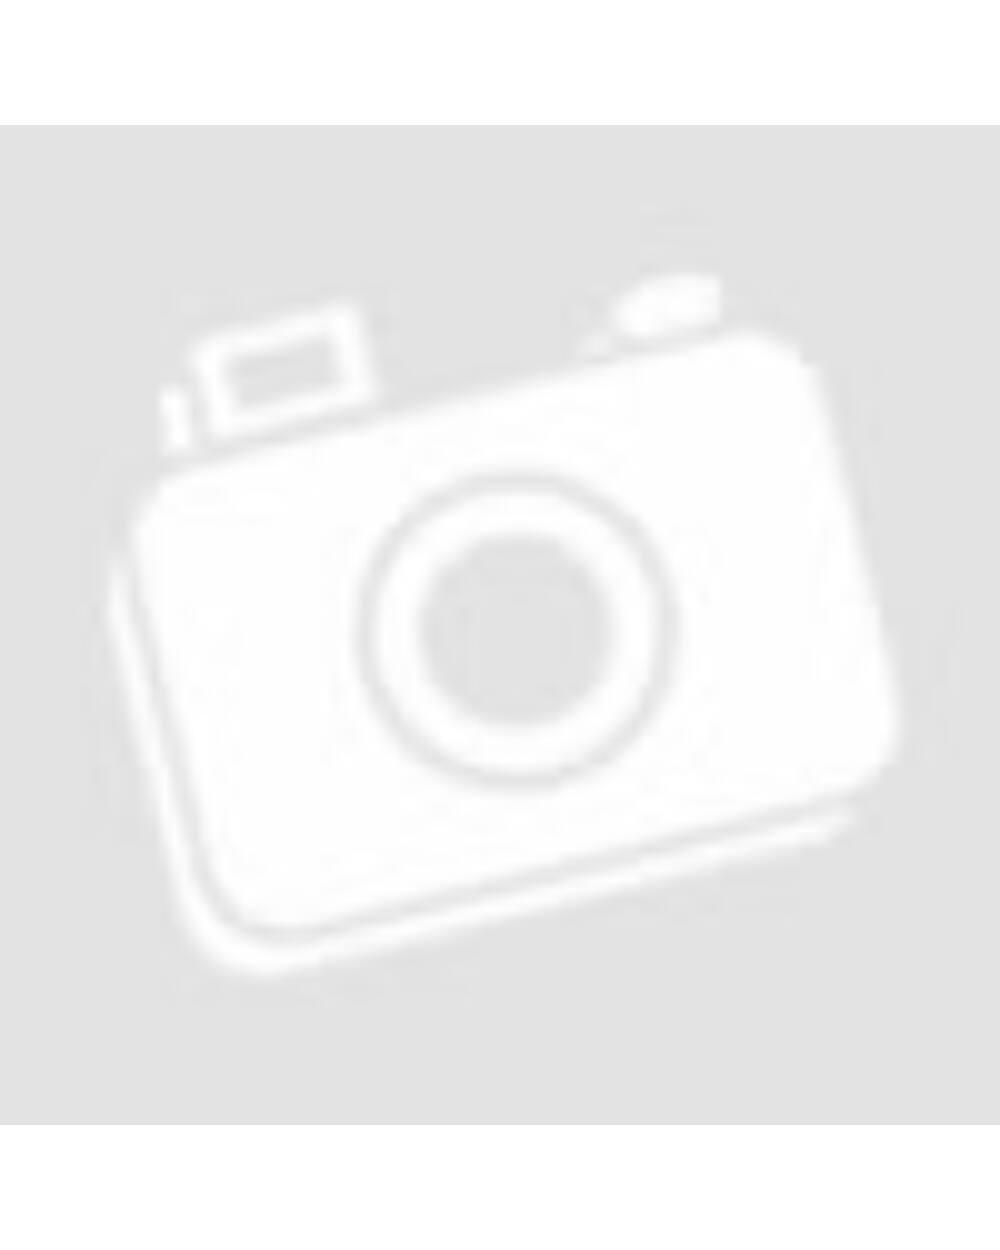 Zajo Gotland 1 ultrakönnyű sátor, exuberance